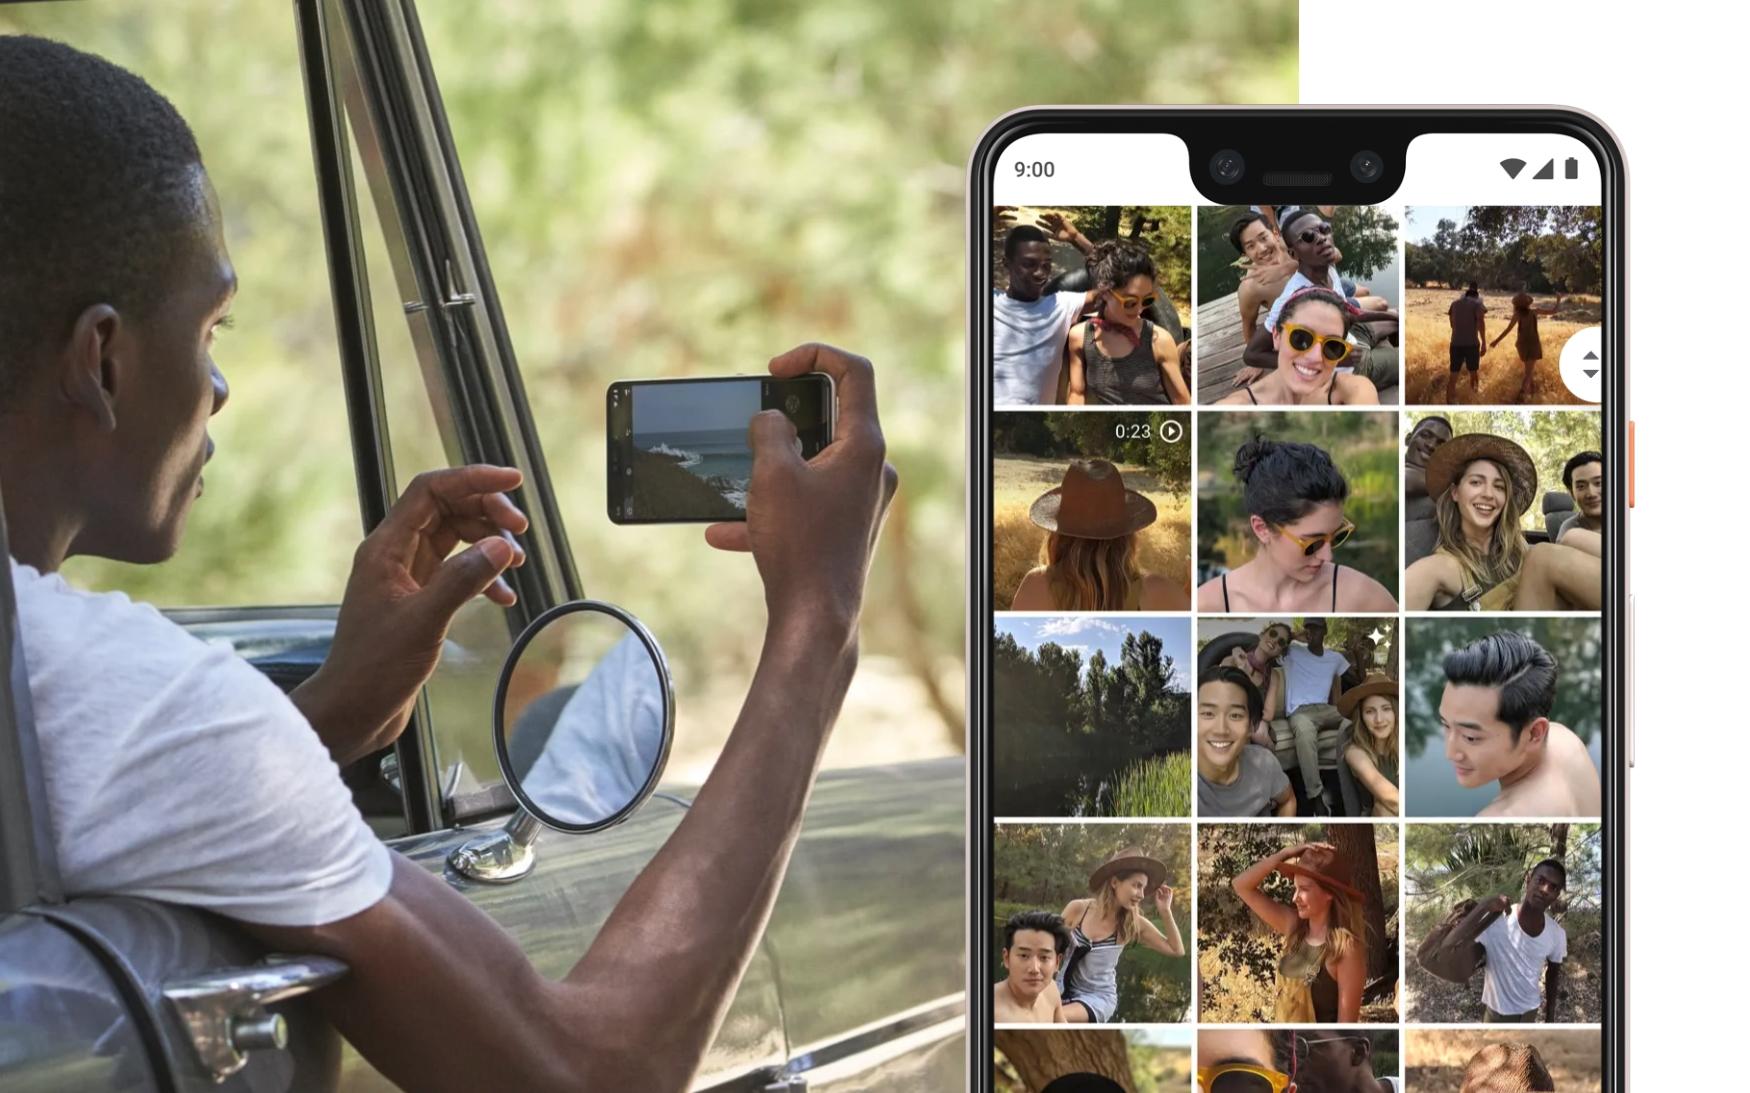 iPhone Xs Max banker Pixel 3 med over 1 minutt, men det er en grunn til at Googles nyeste sliter